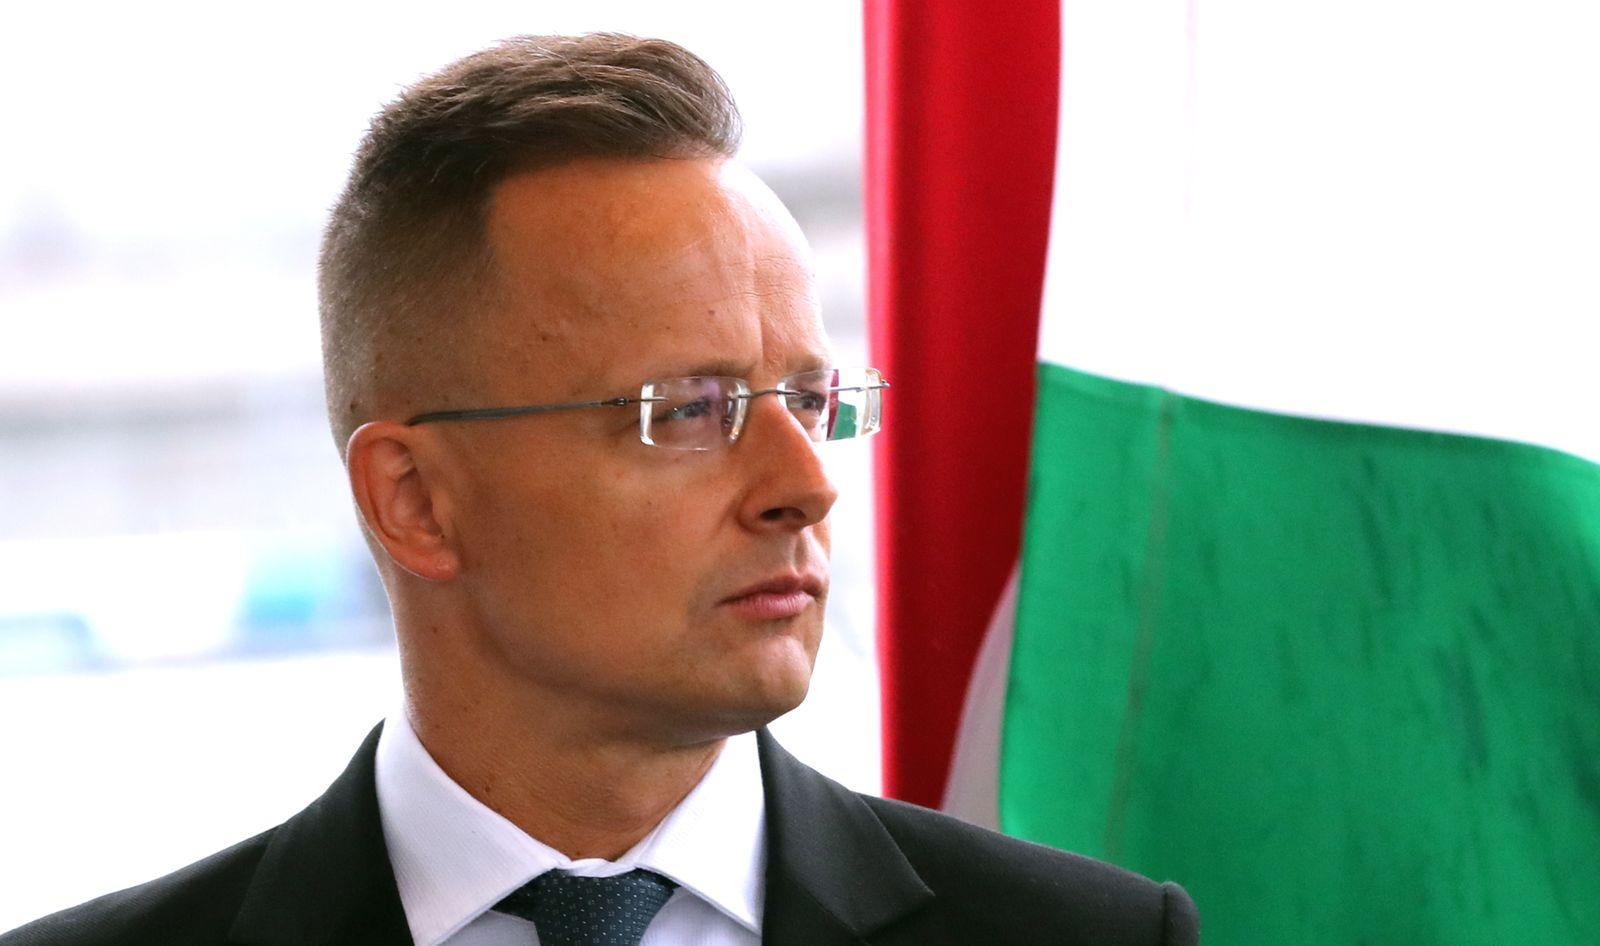 Hungary donates Sinopharm vaccines to Bosnia and Herzegovina